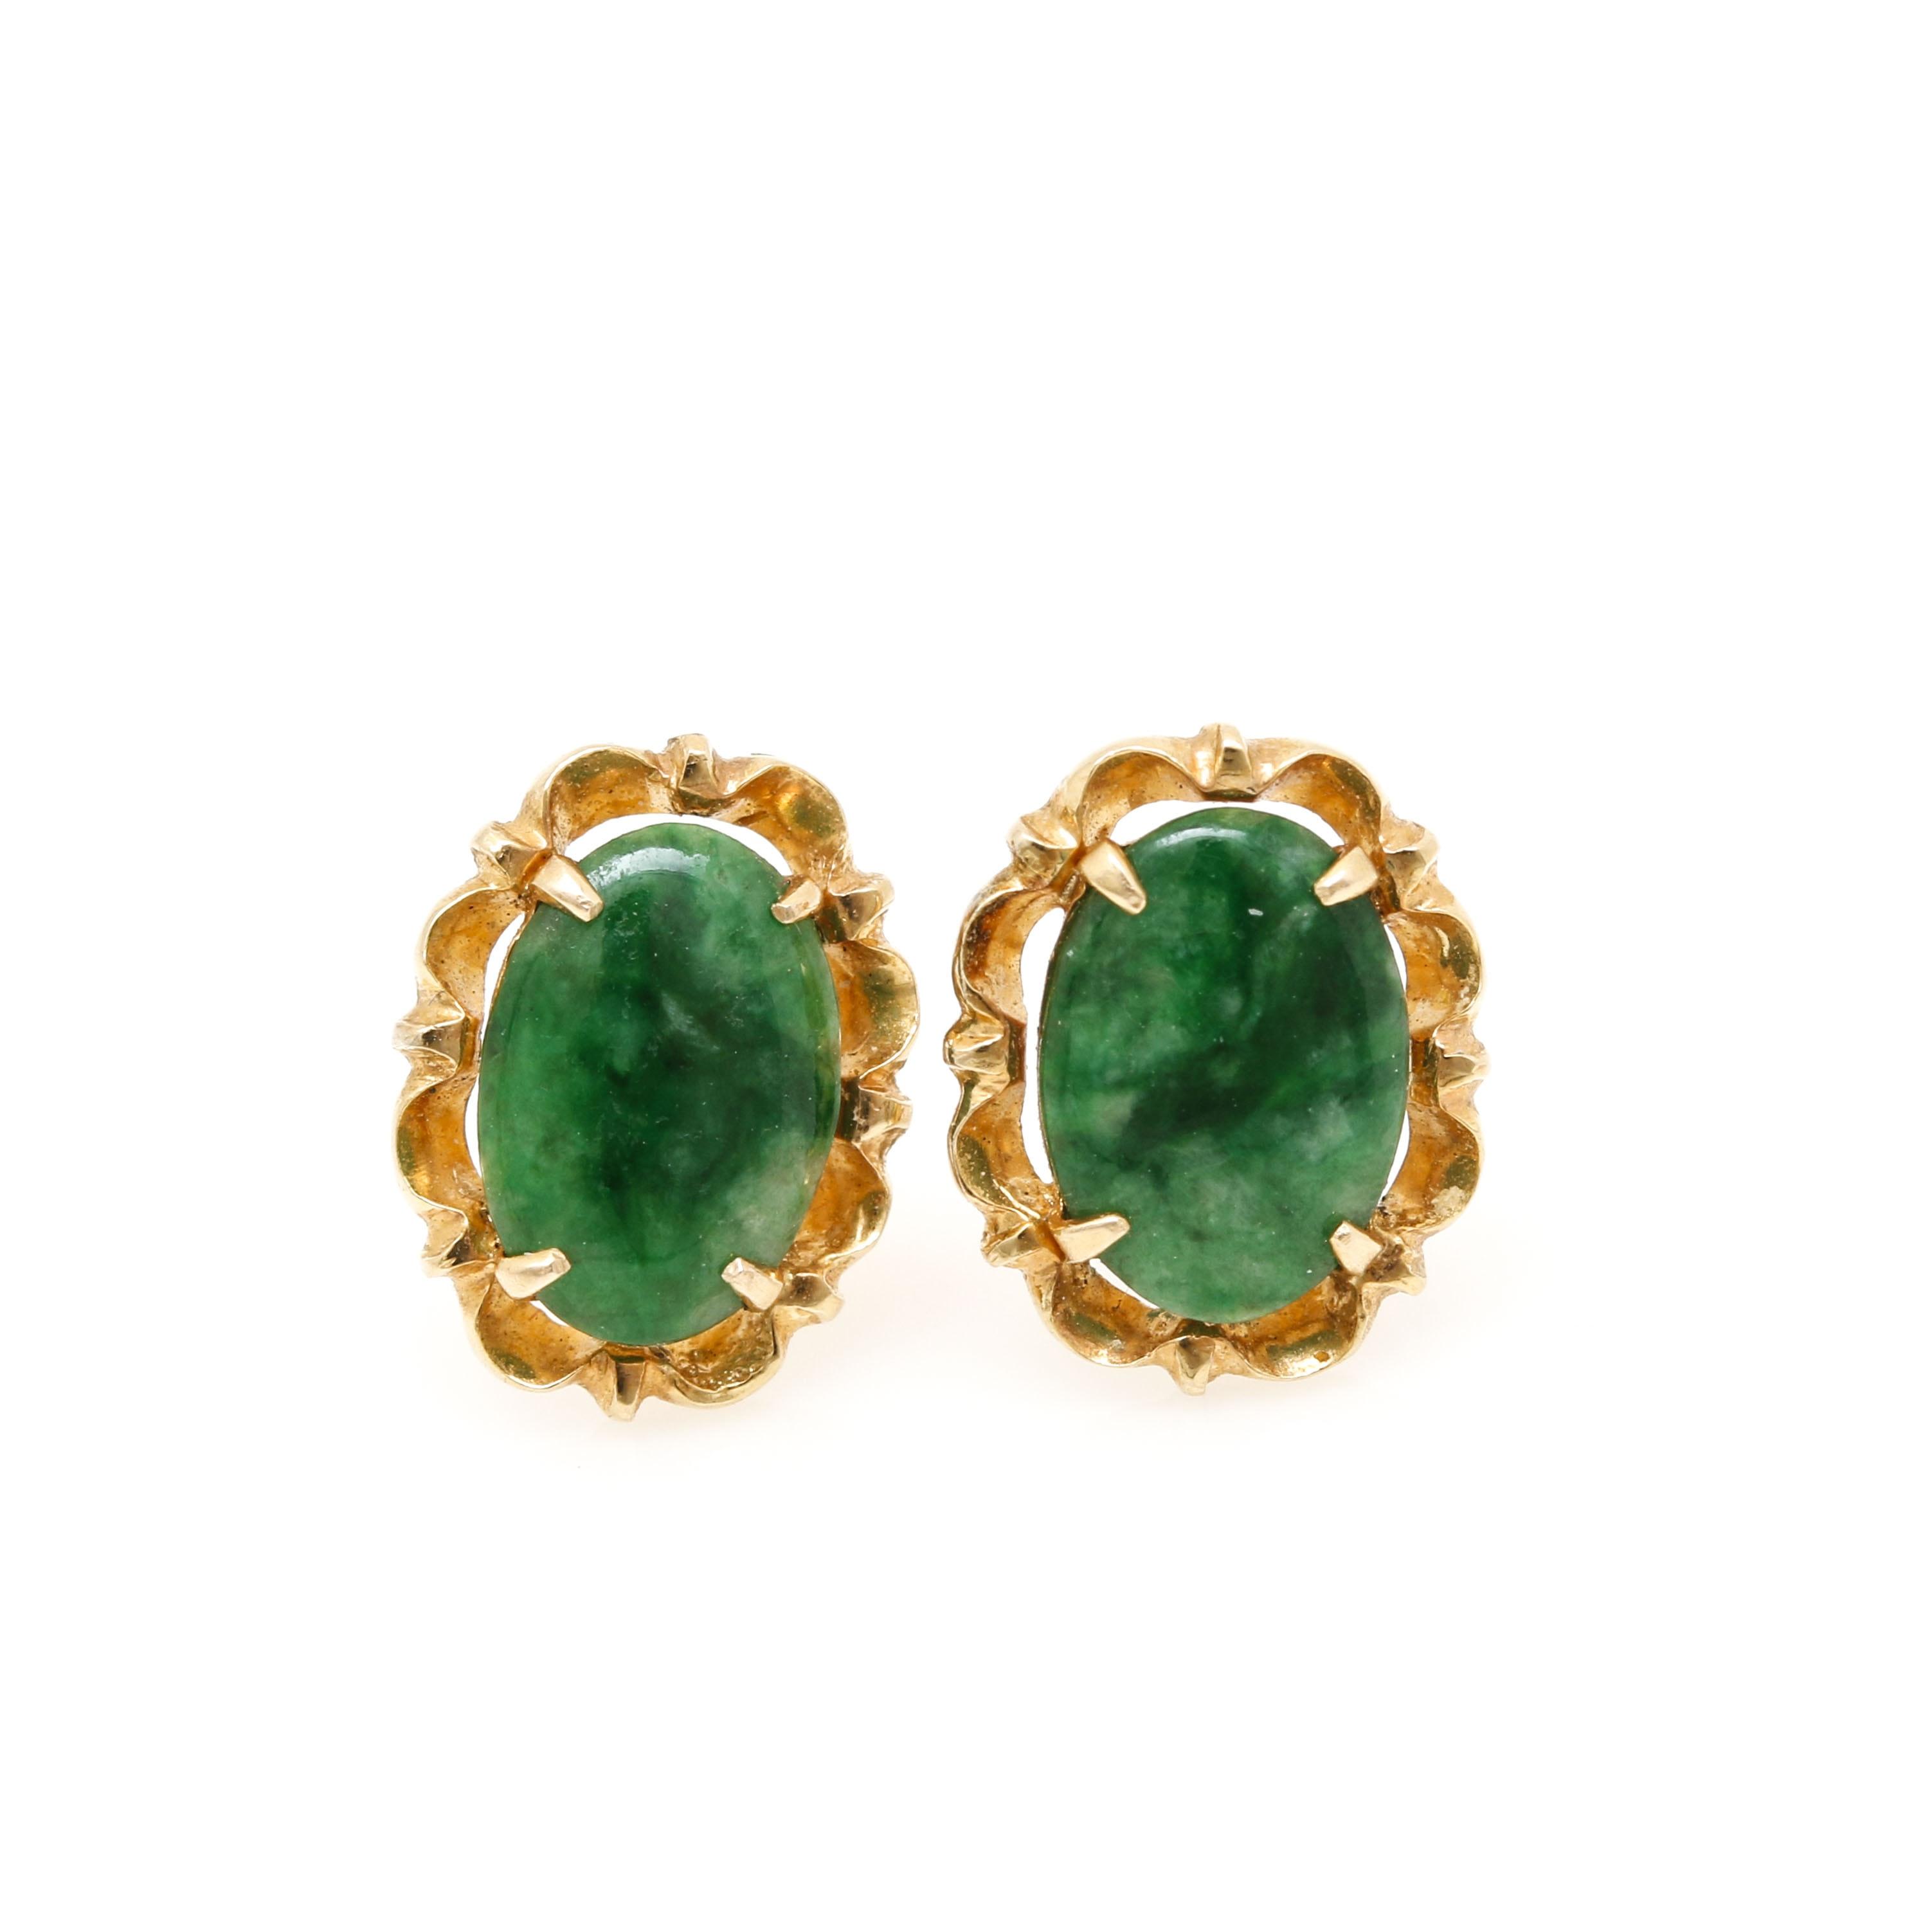 14K Yellow Gold Jadeite Earrings